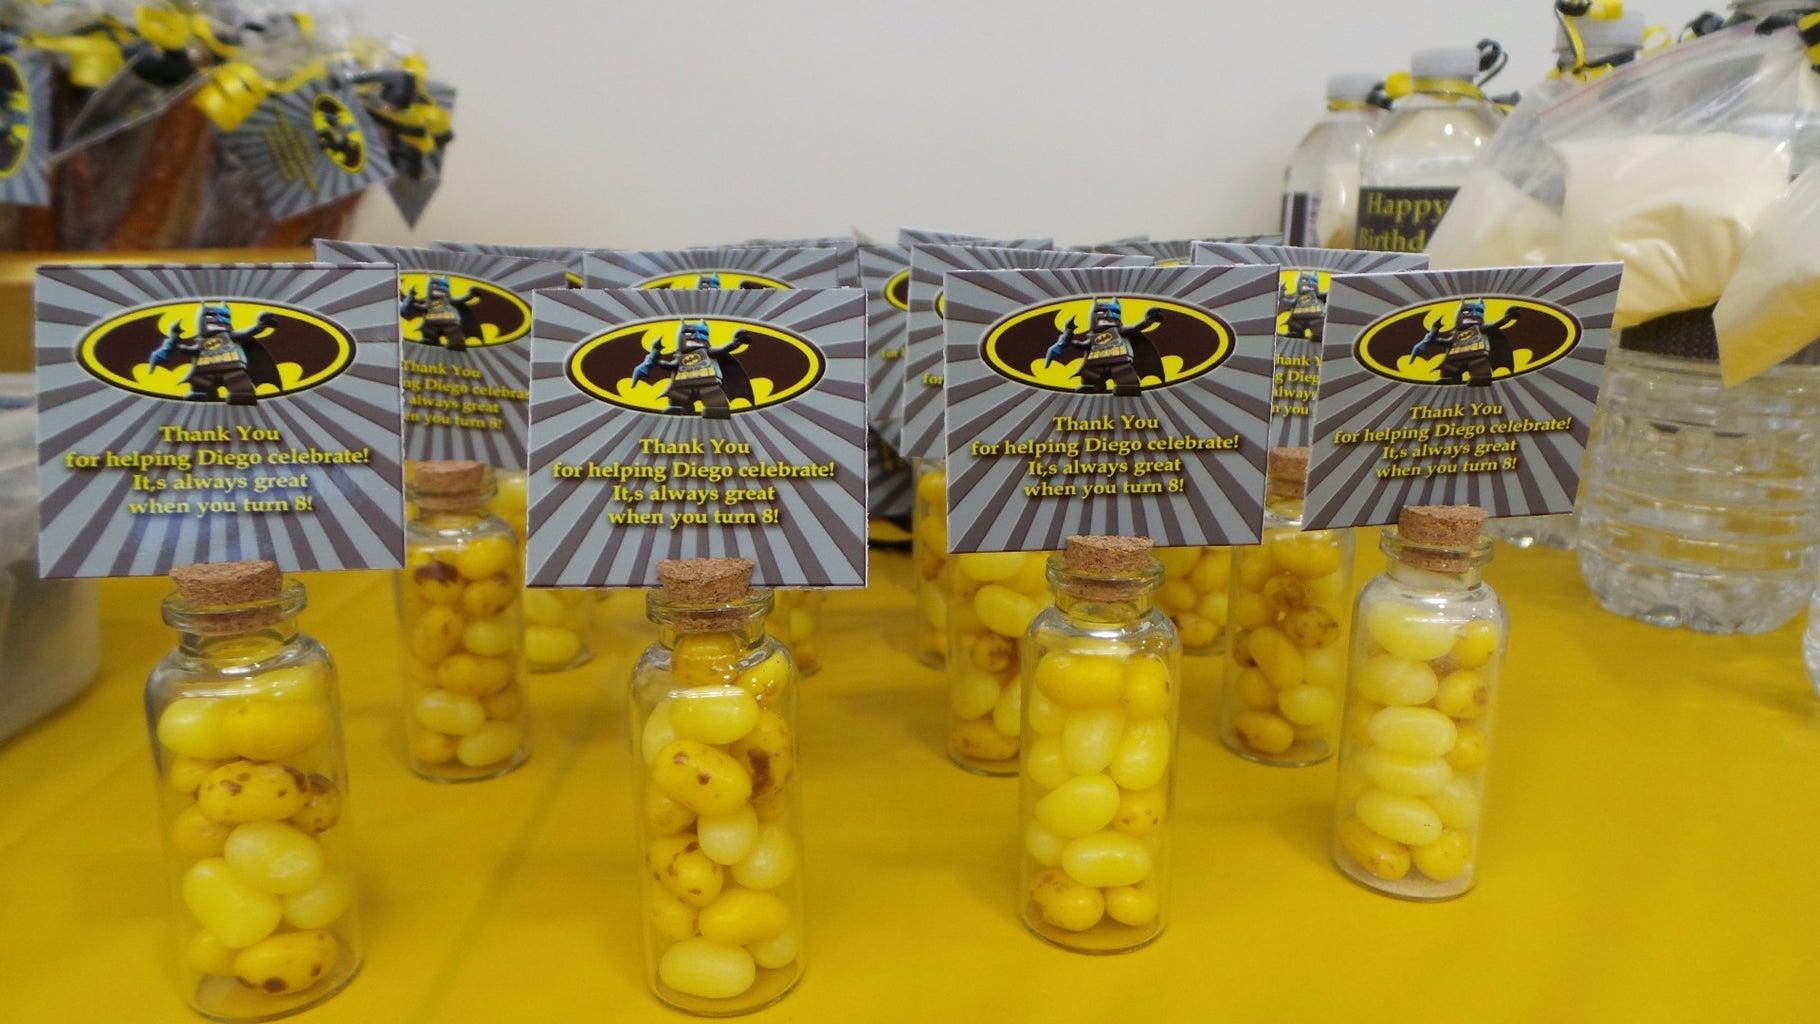 Jellybean Jars